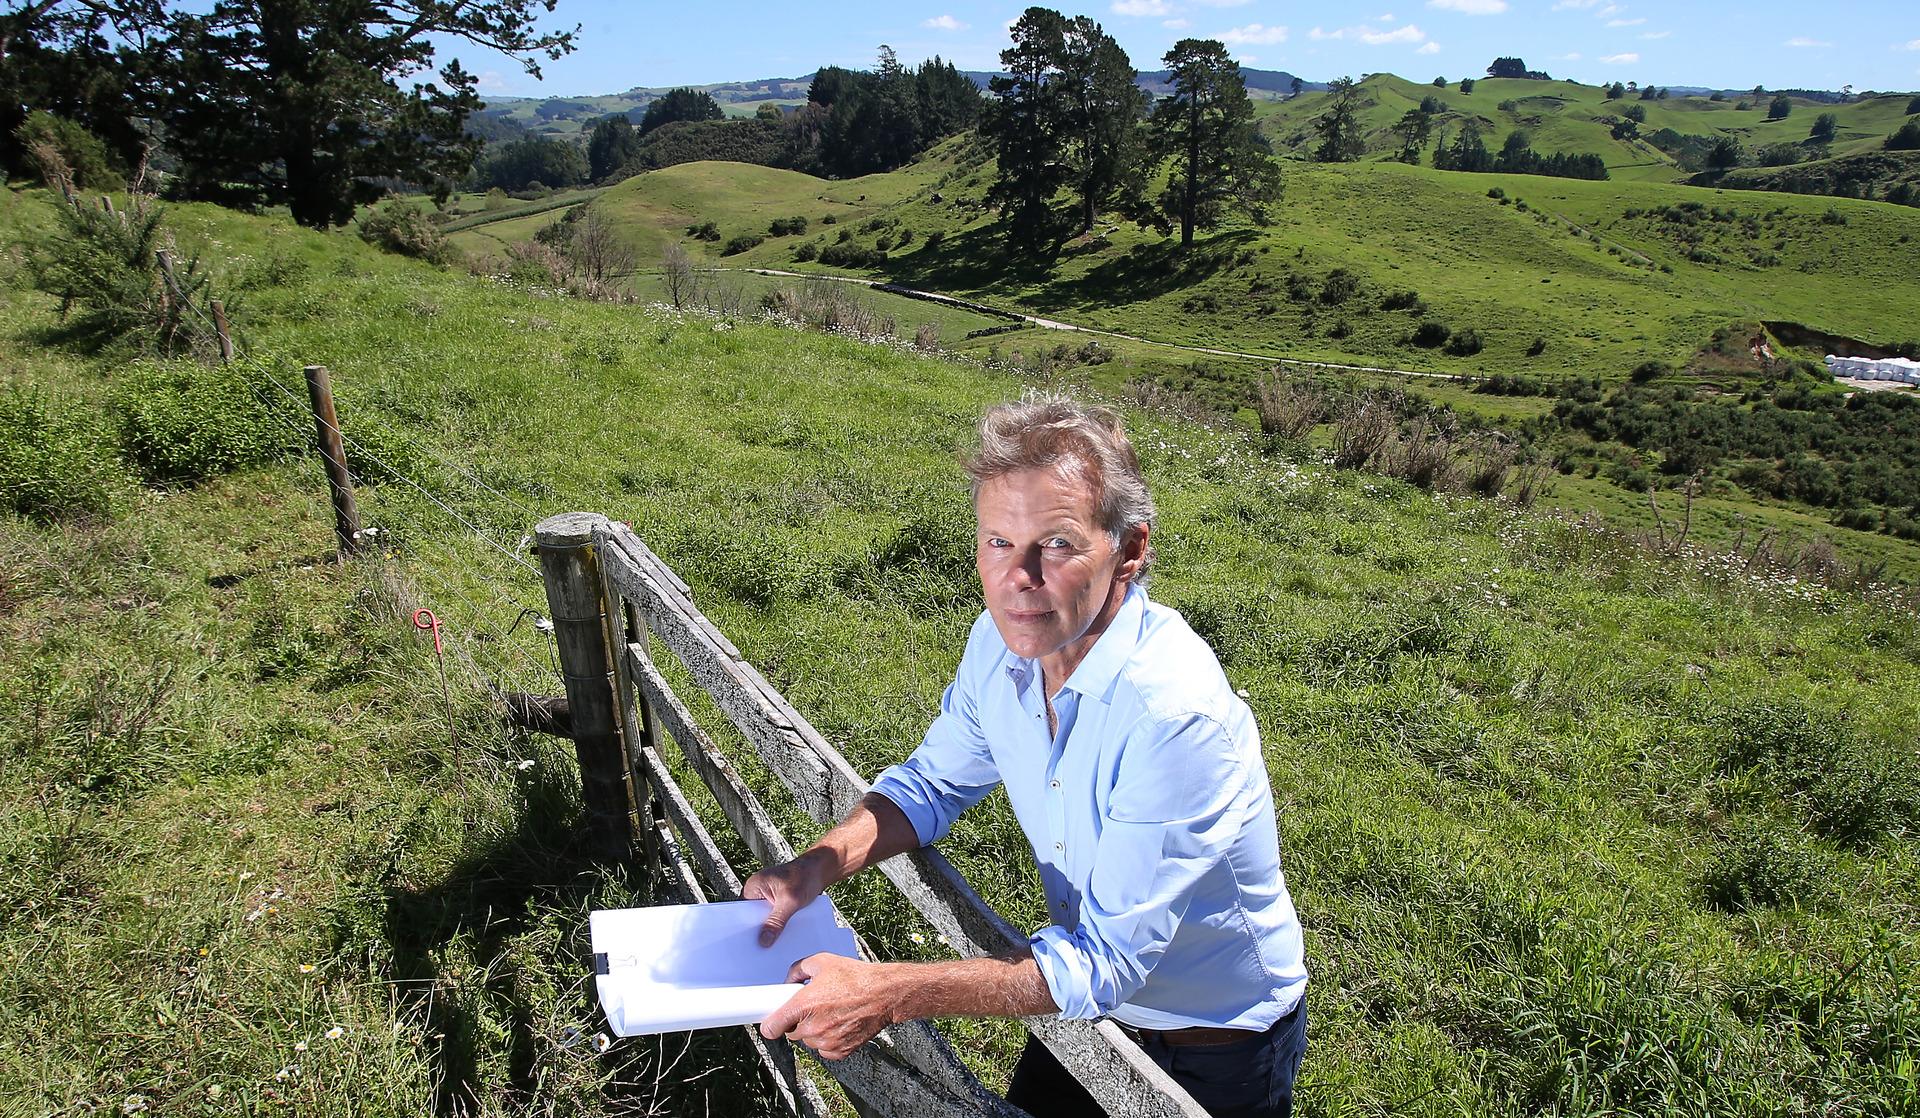 Tauranga a 'city in crisis' as report reveals major housing shortfall